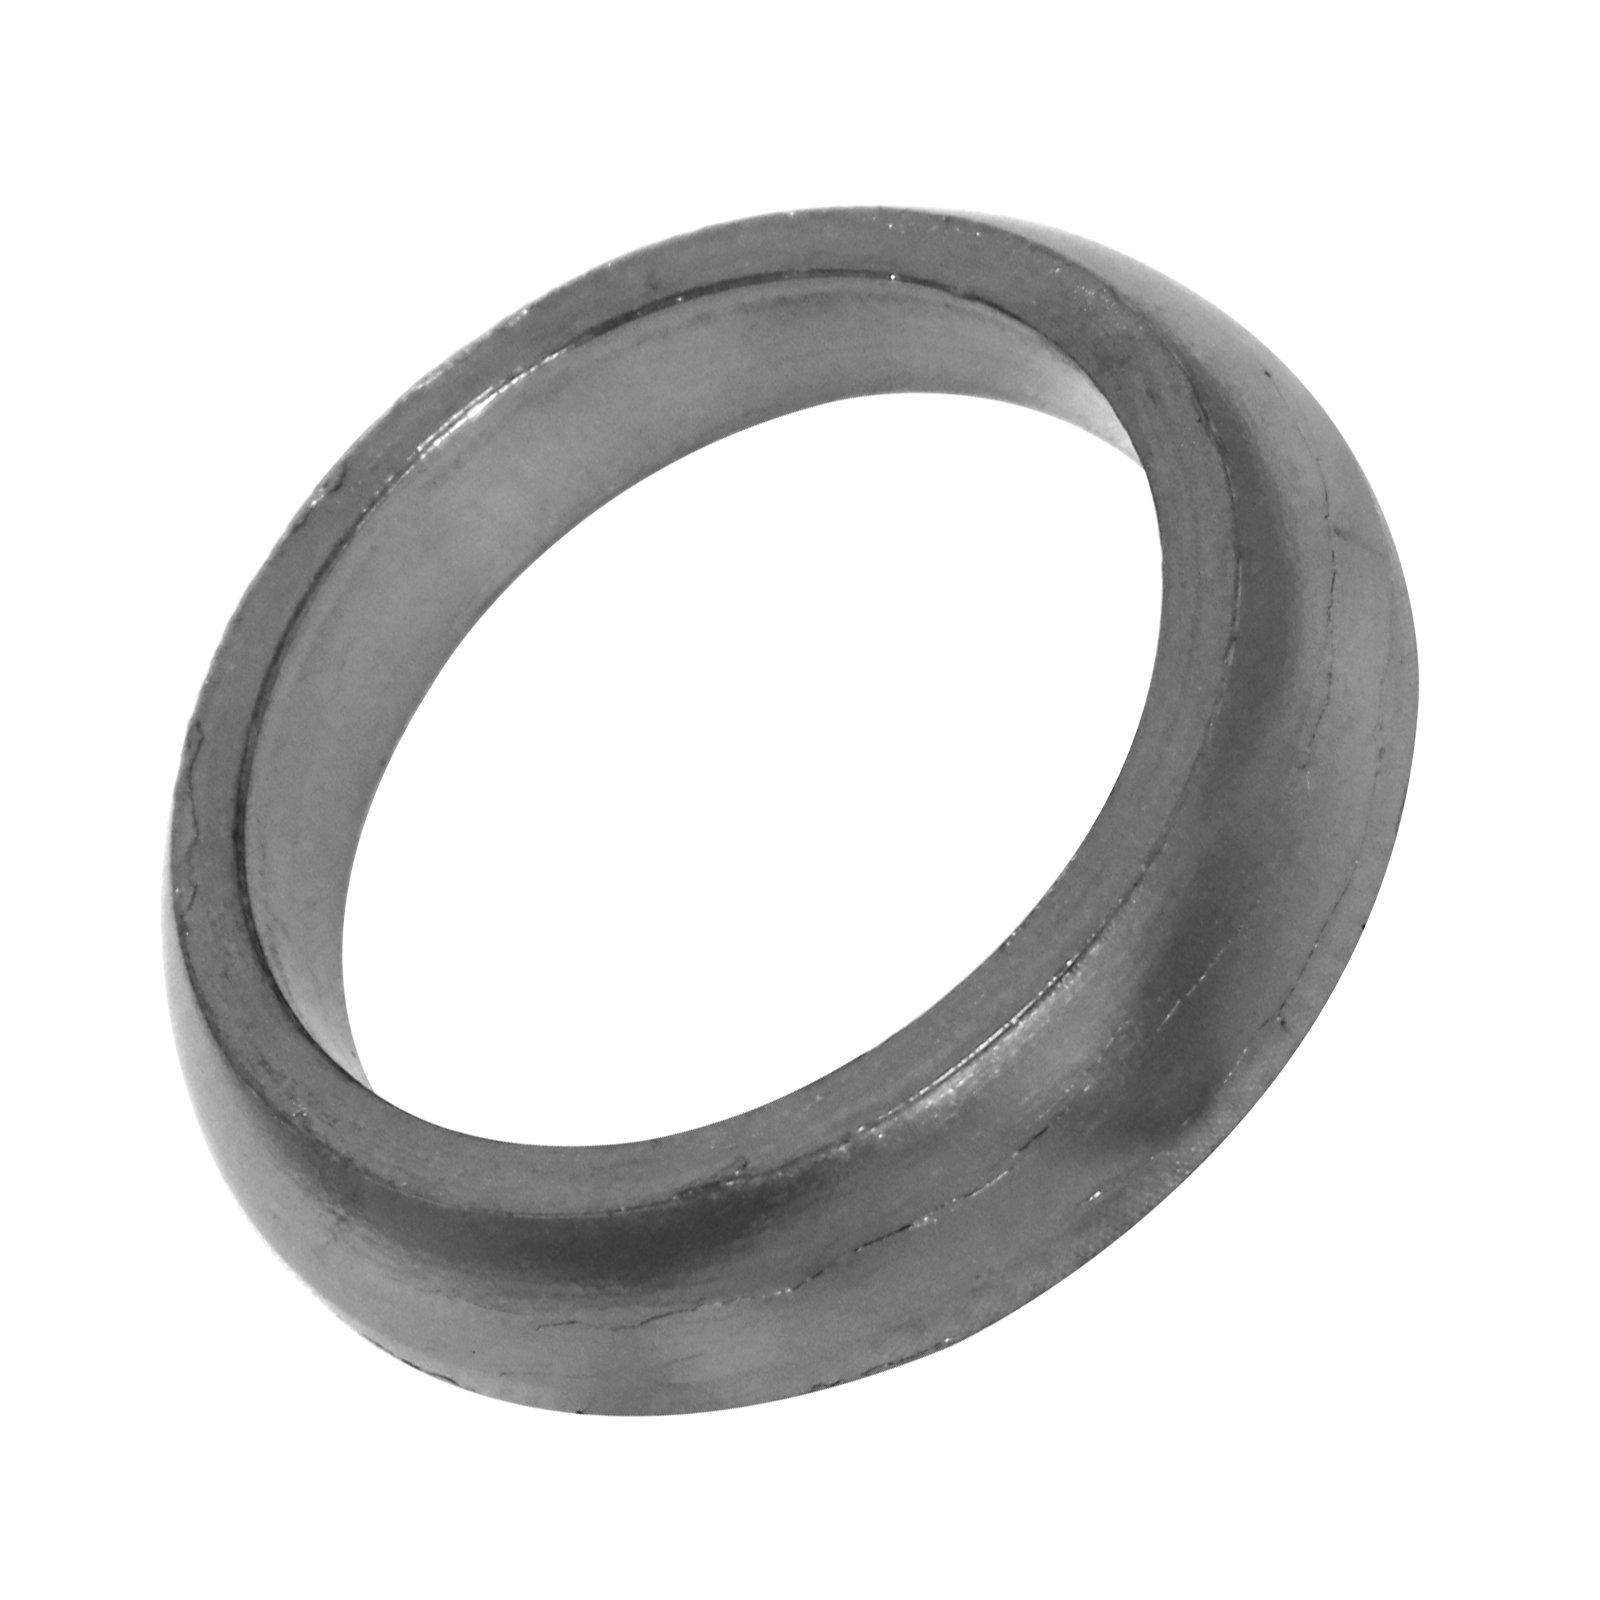 CALTRIC Exhaust Gasket Donut Seal Fits POLARIS RANGER 700 4X4 EFI 2007-2009